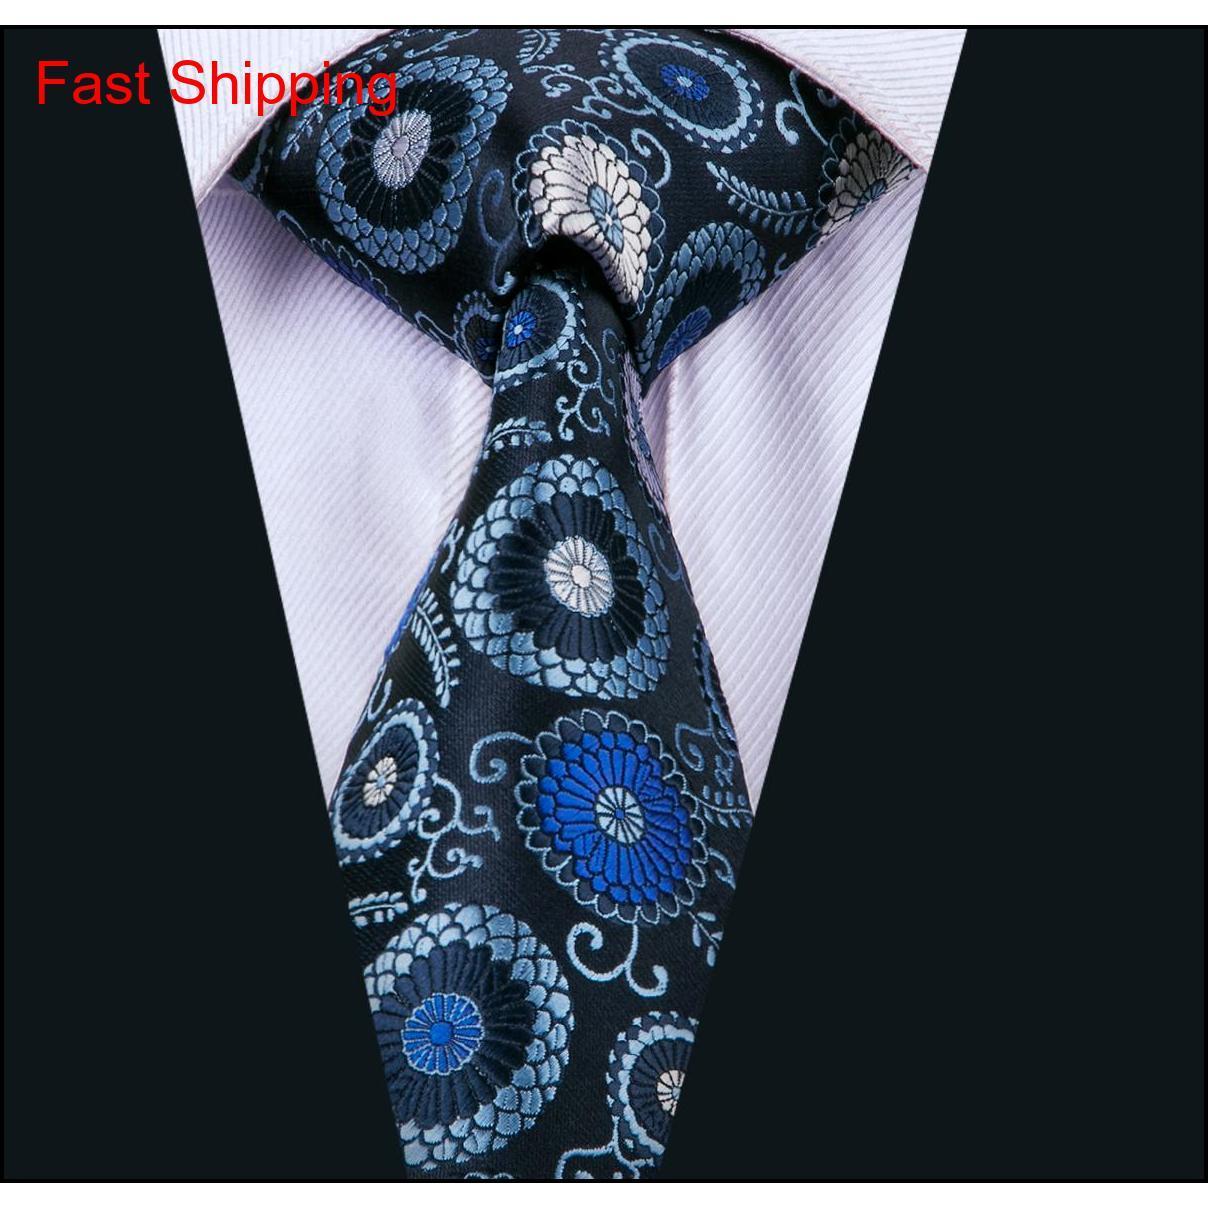 Blue Men Ties Classic Seta Set di cravatta in seta floreale cravatte cravatta cravatta cravatta hanky gemelli jacquard tessuto riunione business we qyngb homes2007